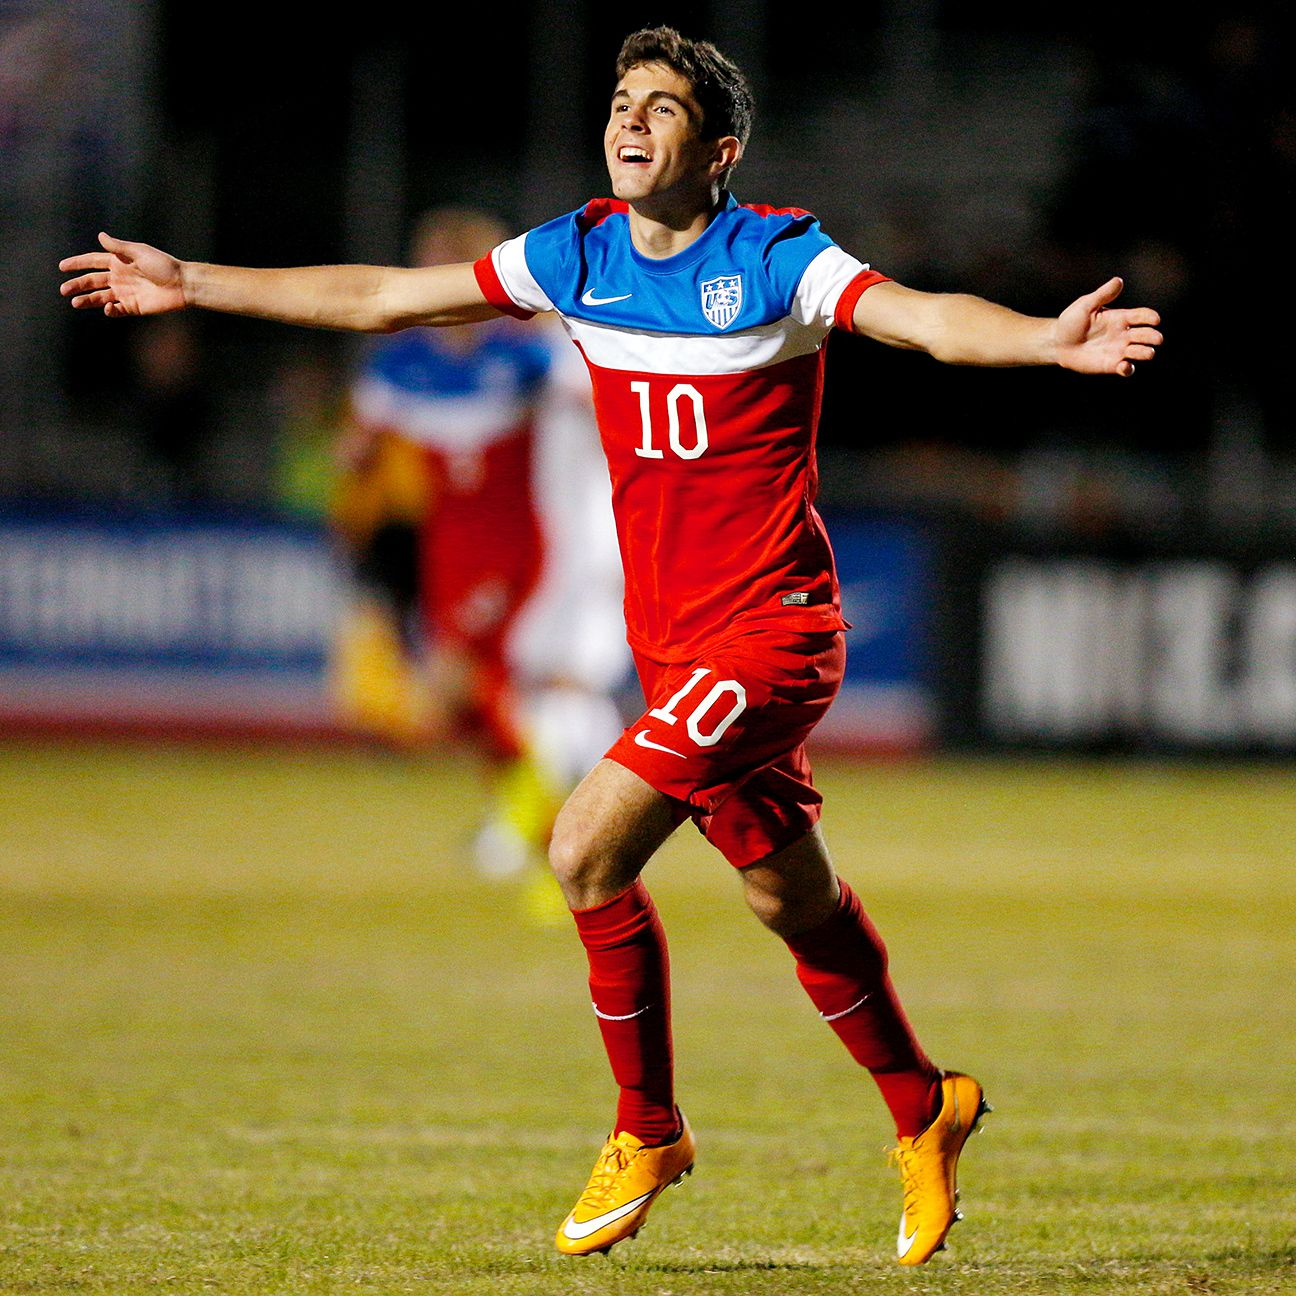 Soccer News And Scores Espn Fc | Autos Post Soccer News Espn